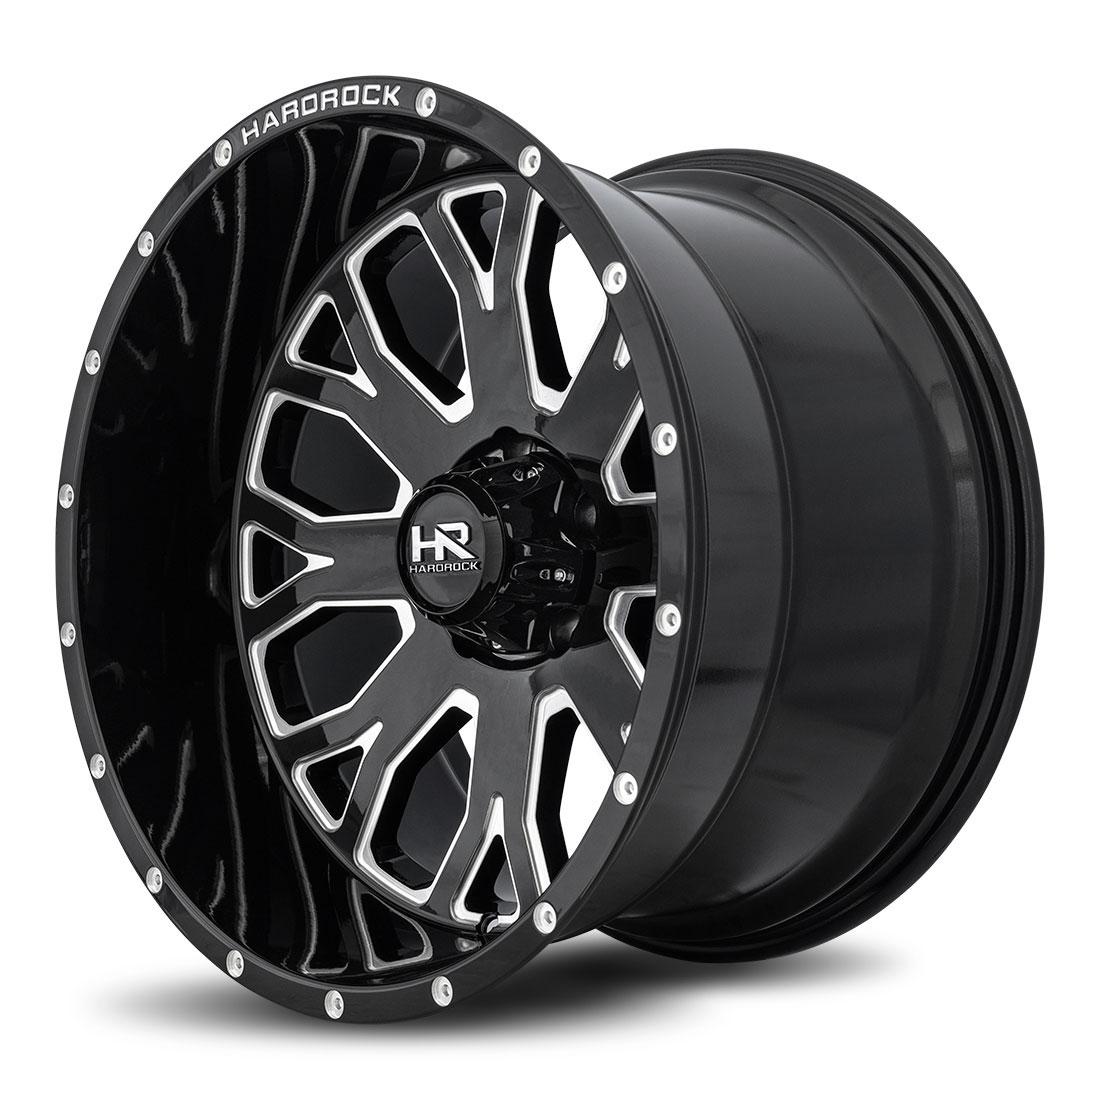 Hardrock Offroad Wheels H504 Slammer-Xposed - Gloss Black Milled - 24x12